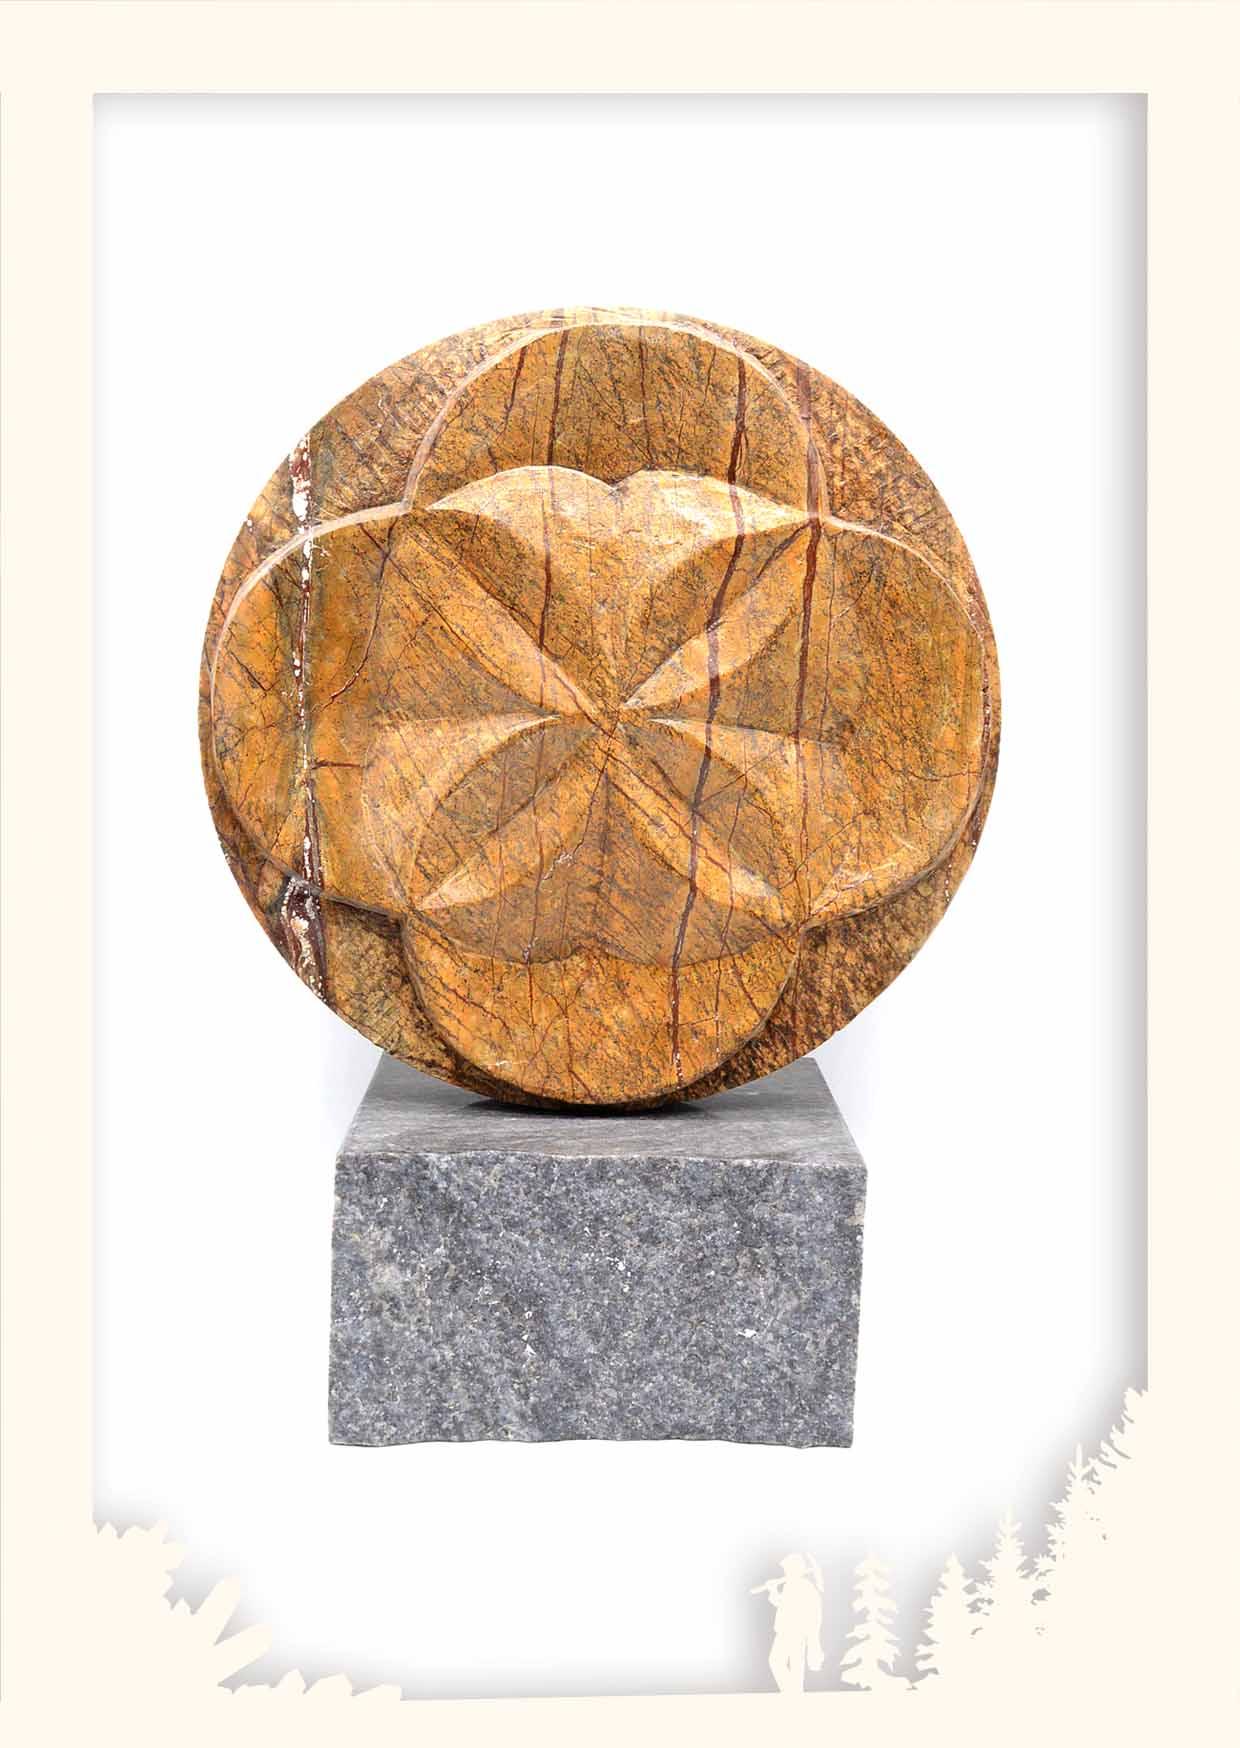 Skulptur Blume des Lebens, Forest Brown, auf Granit Sockel